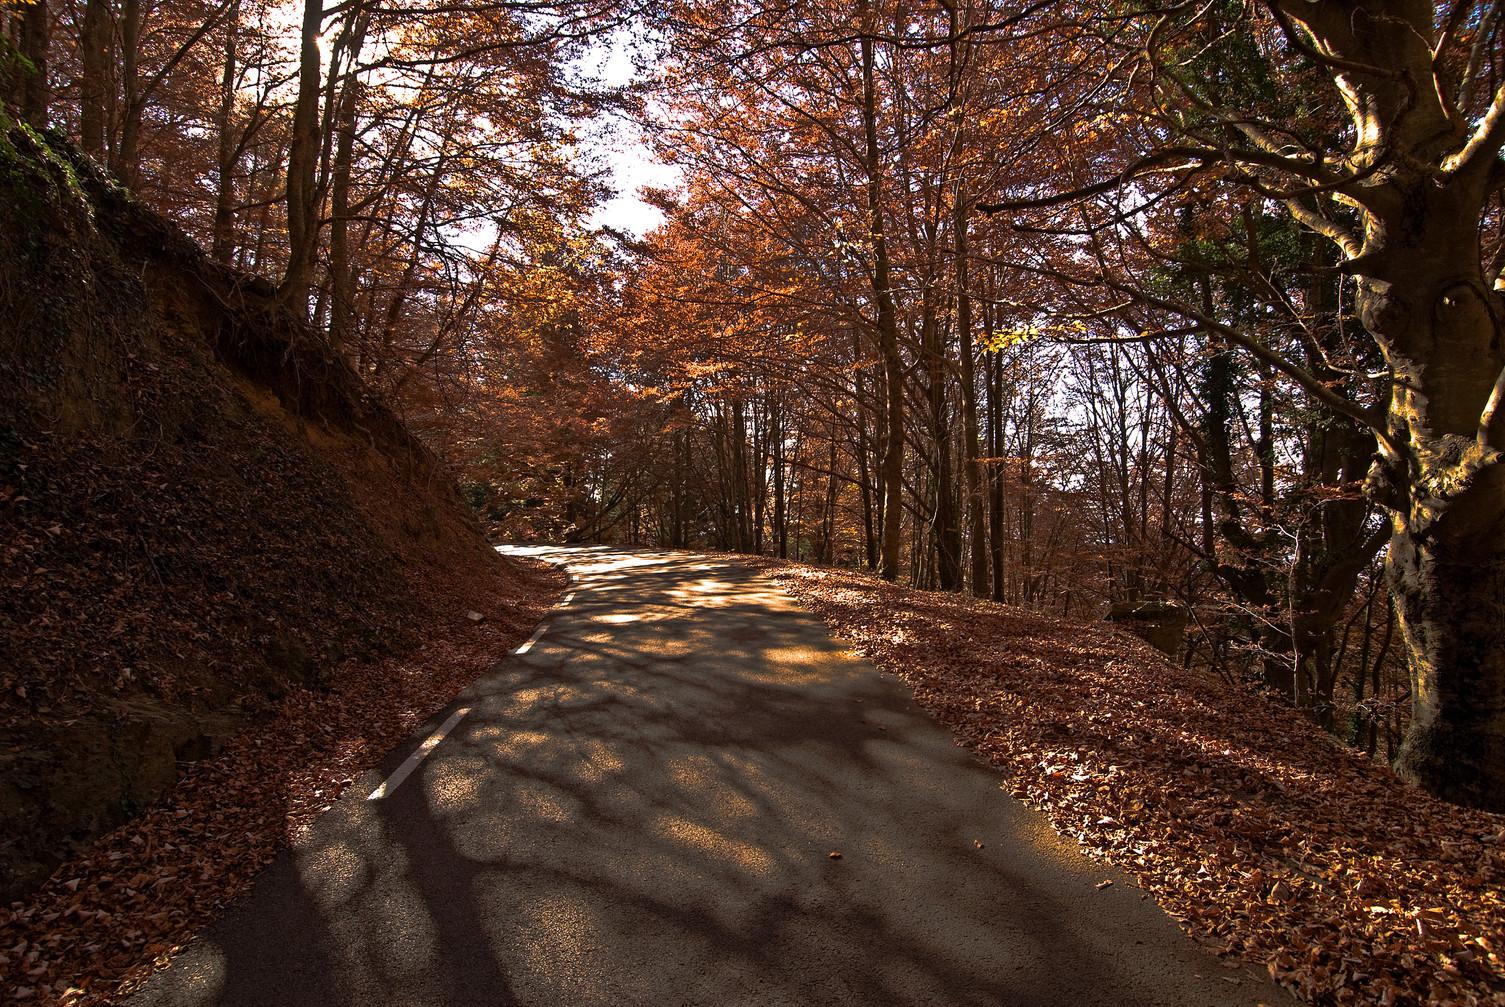 Beautiful road in fall, at Montseny (Spain)